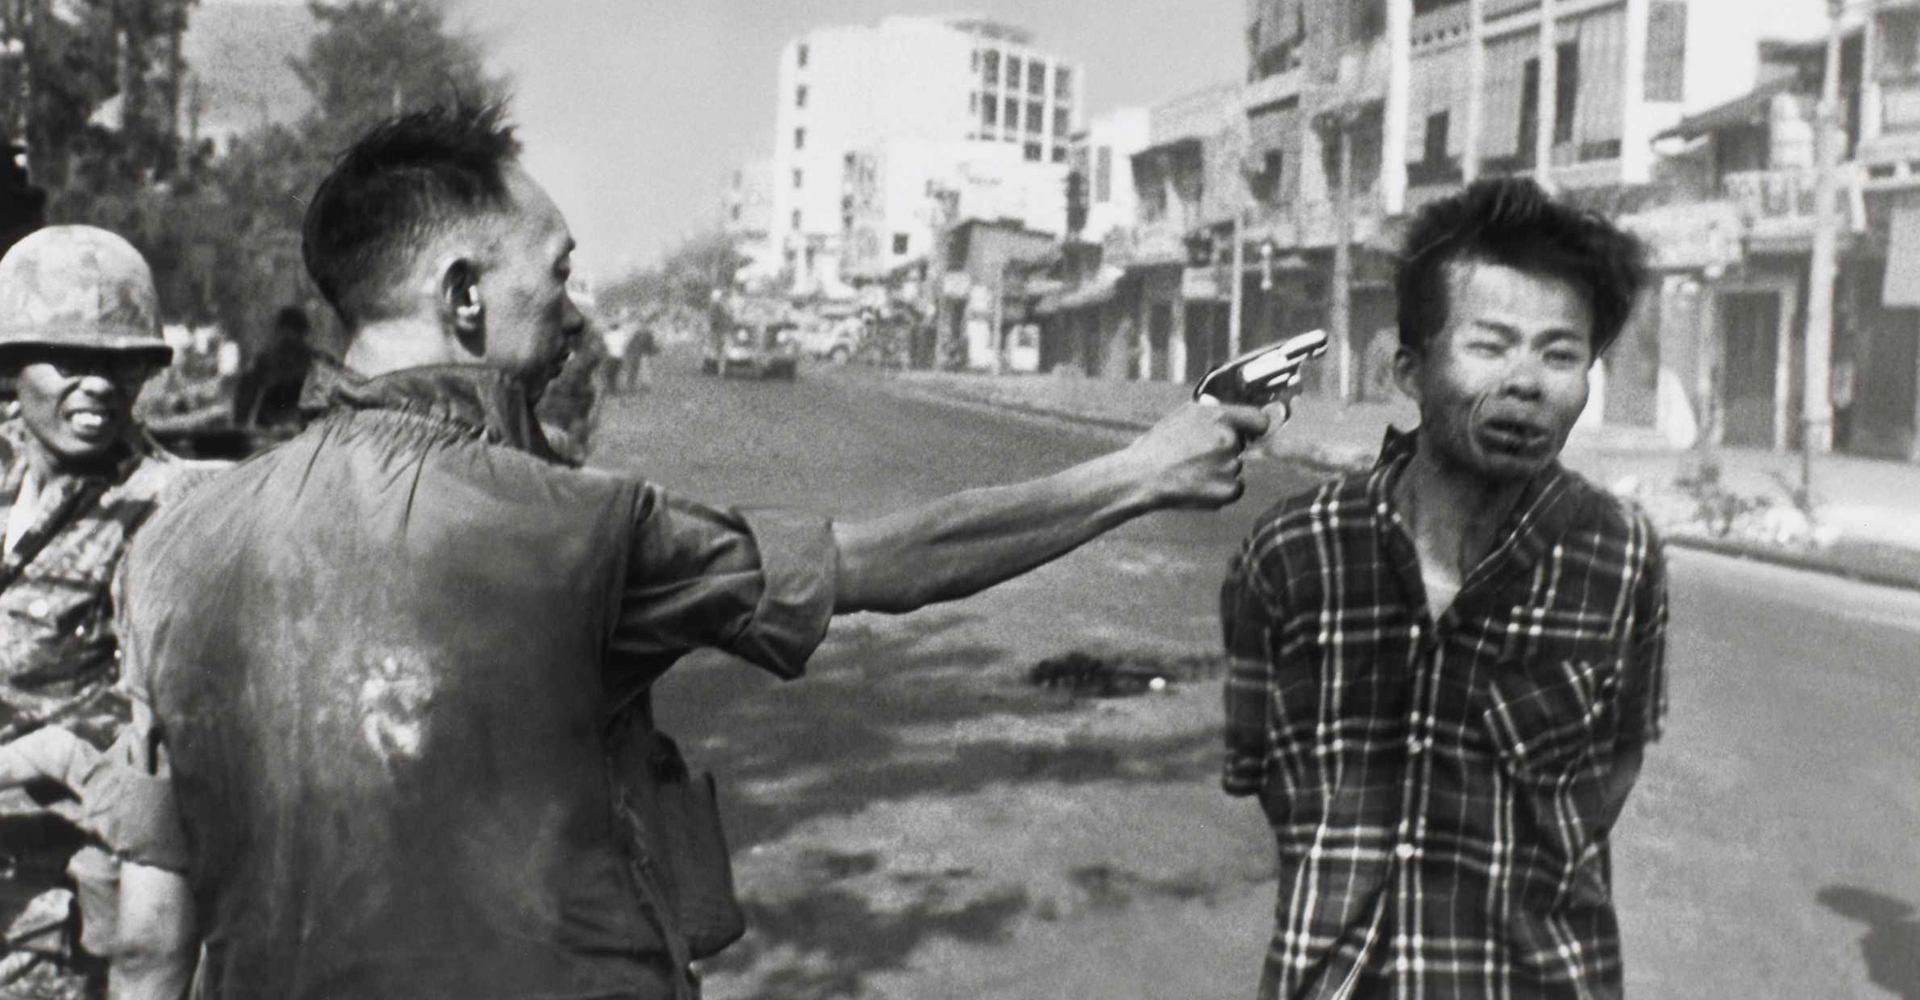 Police Commander Nguyen Ngoc Loan killing Viet Cong operative Nguyen Van Lem - February 1968